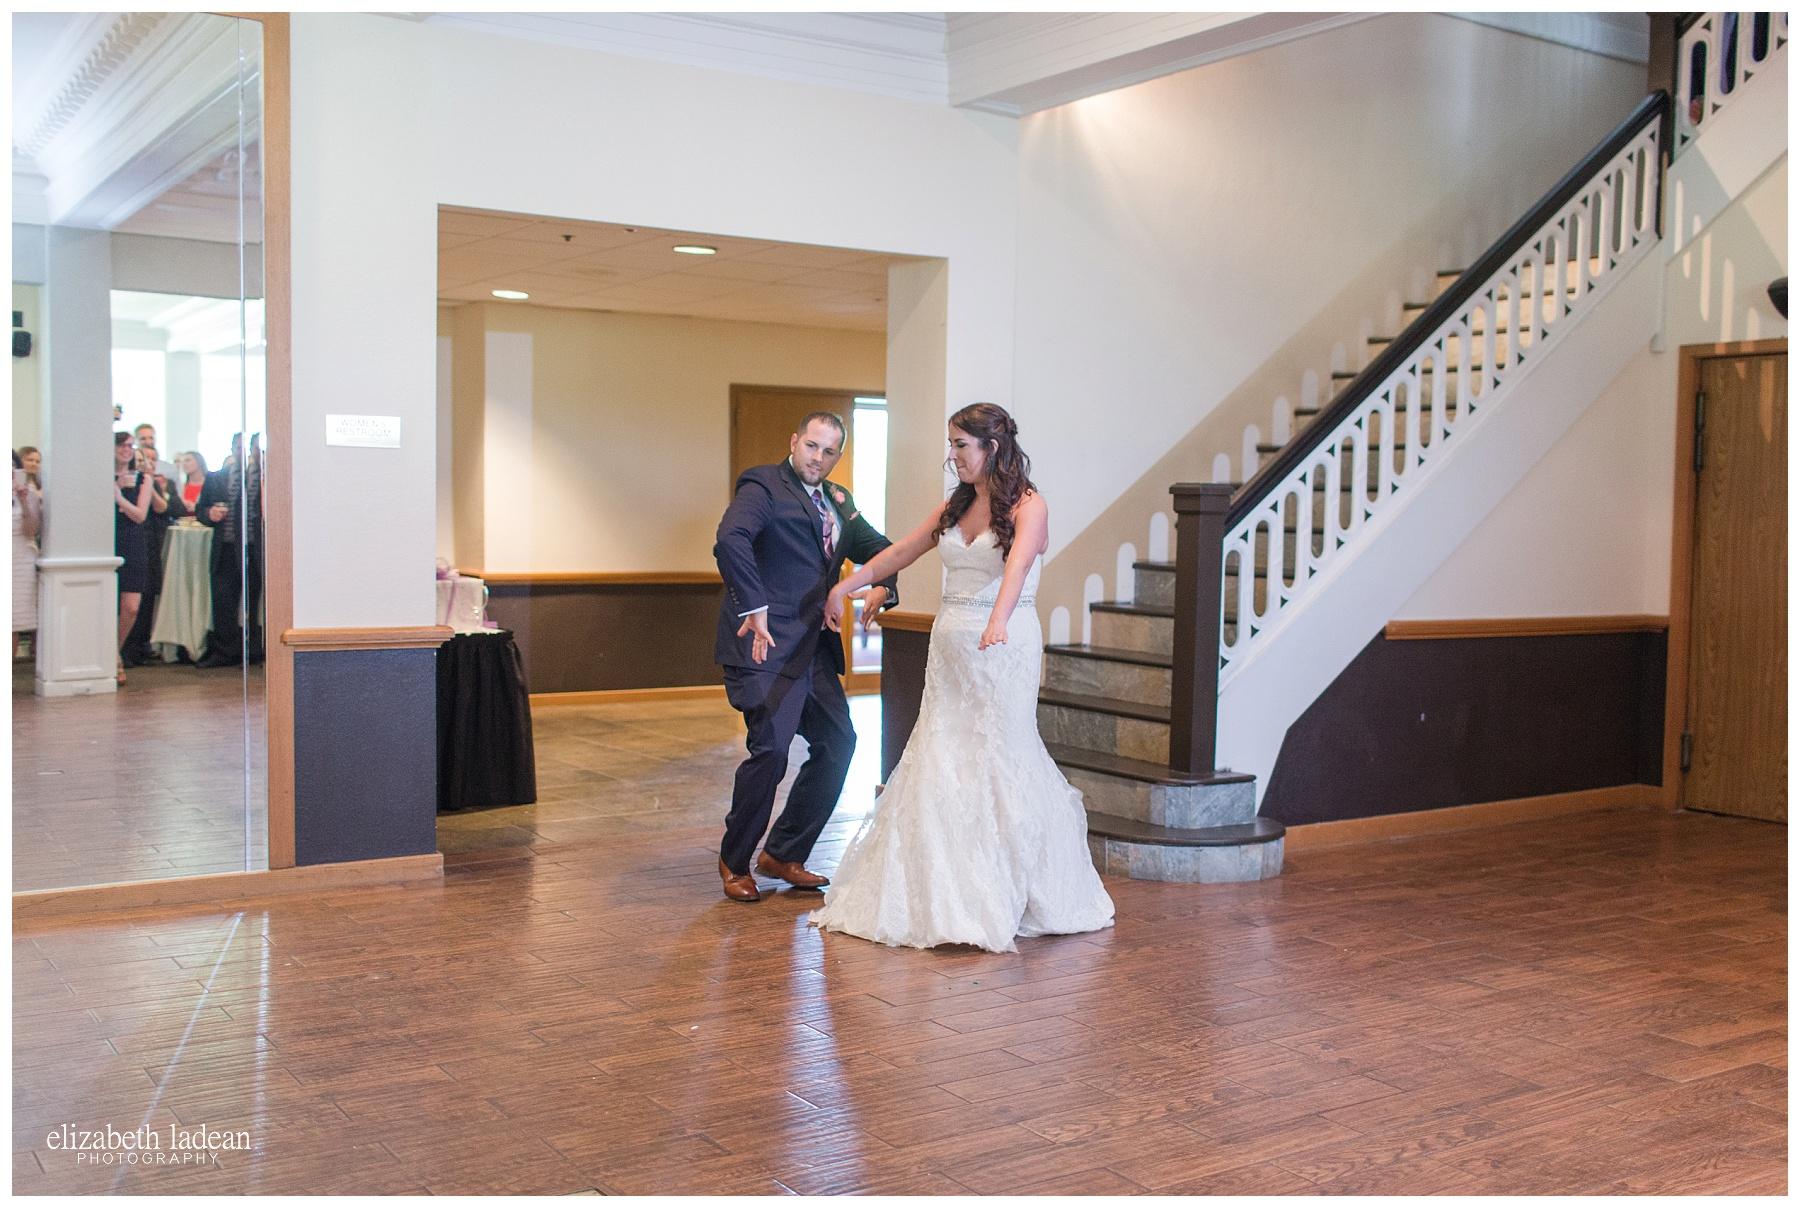 Hillcrest-Country-Club-Kansas-City-Wedding-Photography-E+J-0520-Elizabeth-Ladean-Photography-photo_0856.jpg